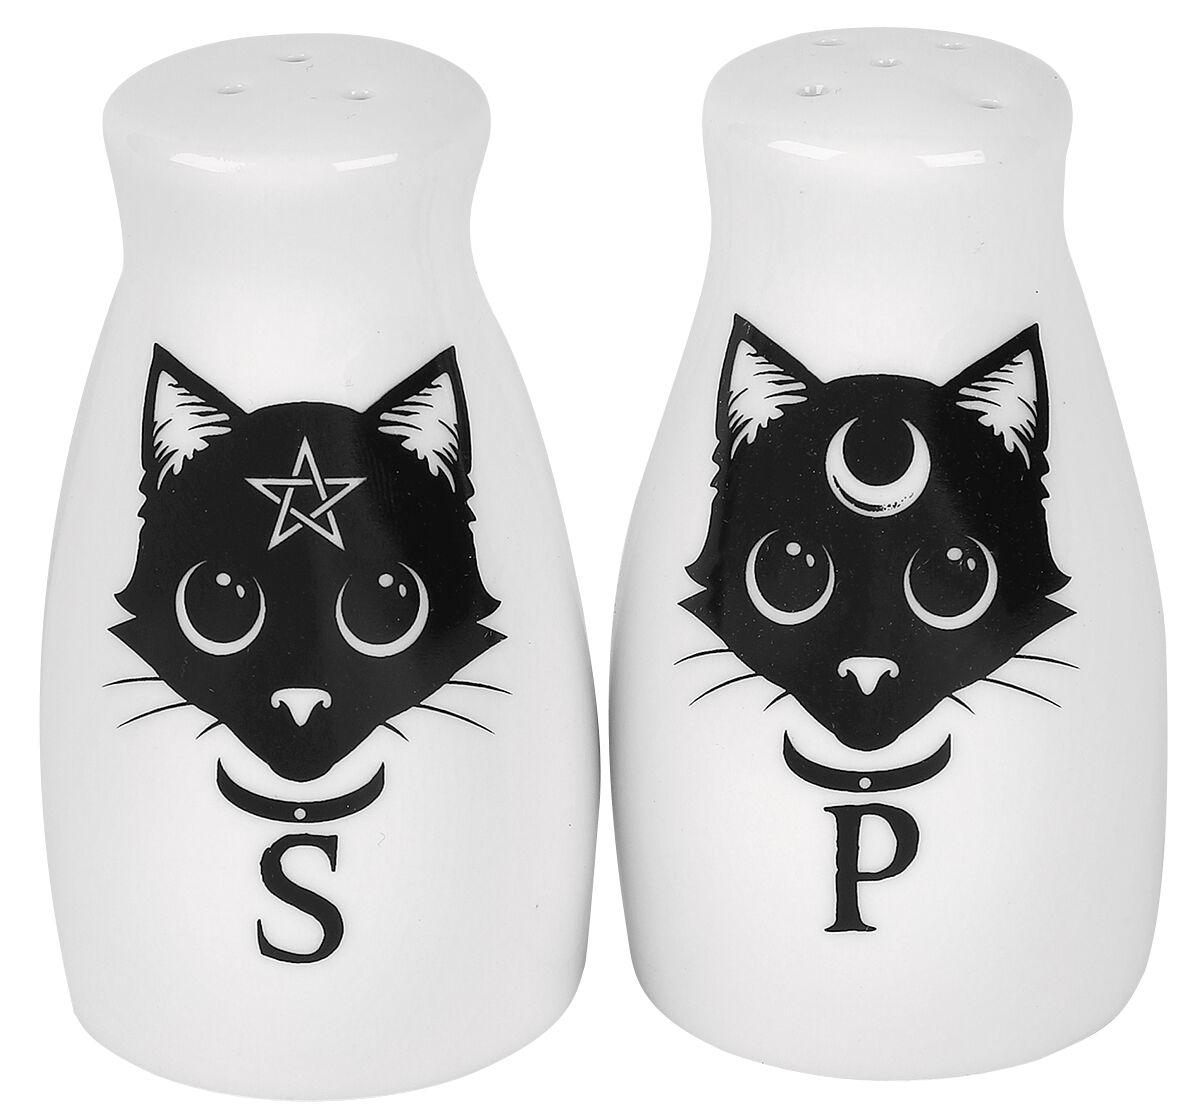 Alchemy England Salz- und Pfefferstreuer Salz- & Pfefferstreuer weiß schwarz MRSP3